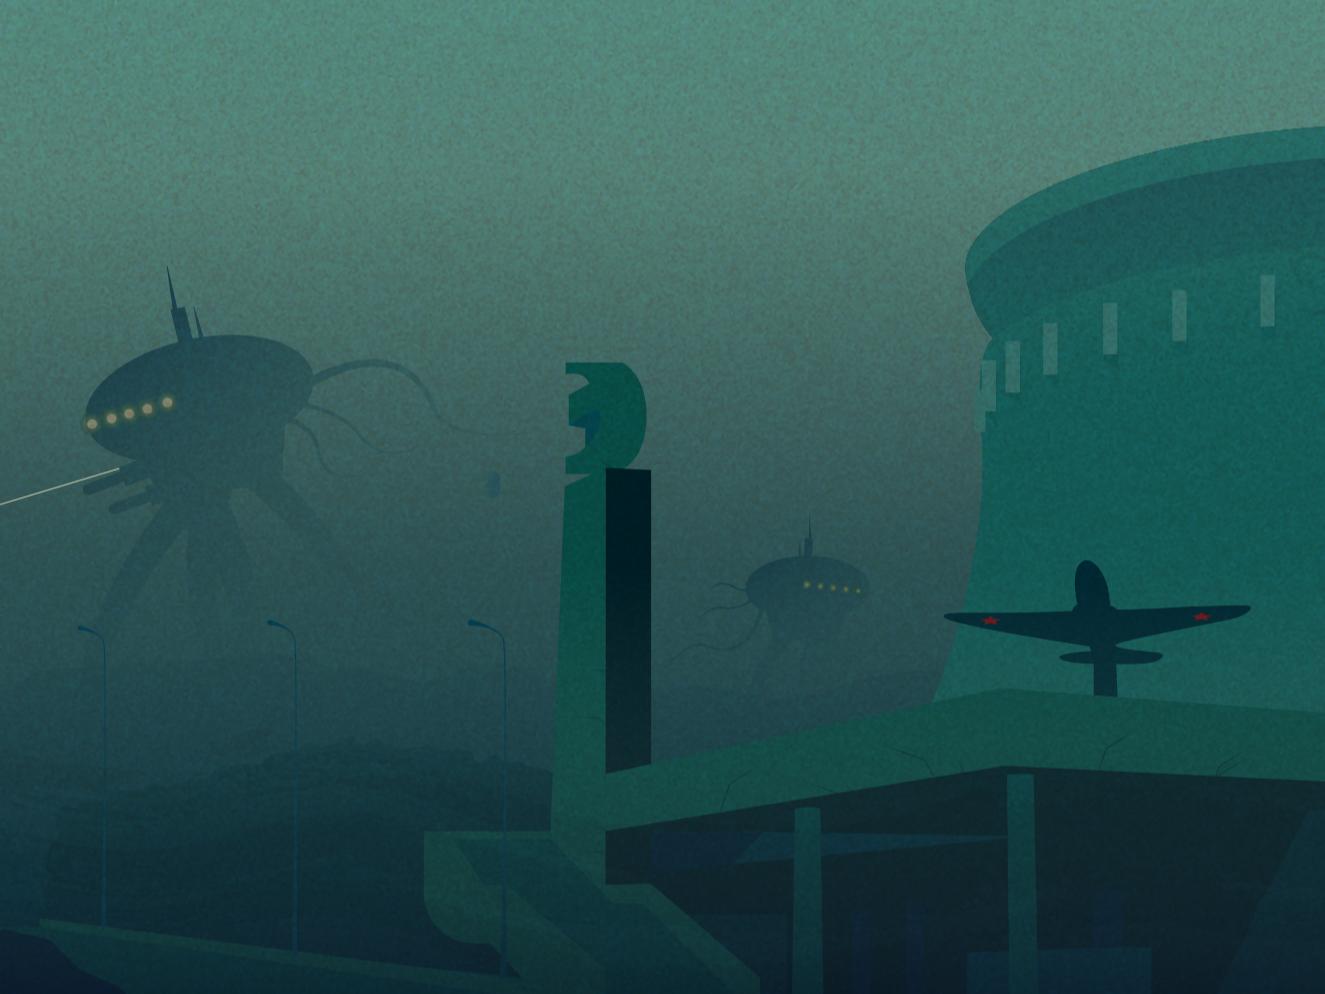 District 34 futuristic apocalypse future vector art illustrations artwork vector illustration vector illustrator illustration art illustration